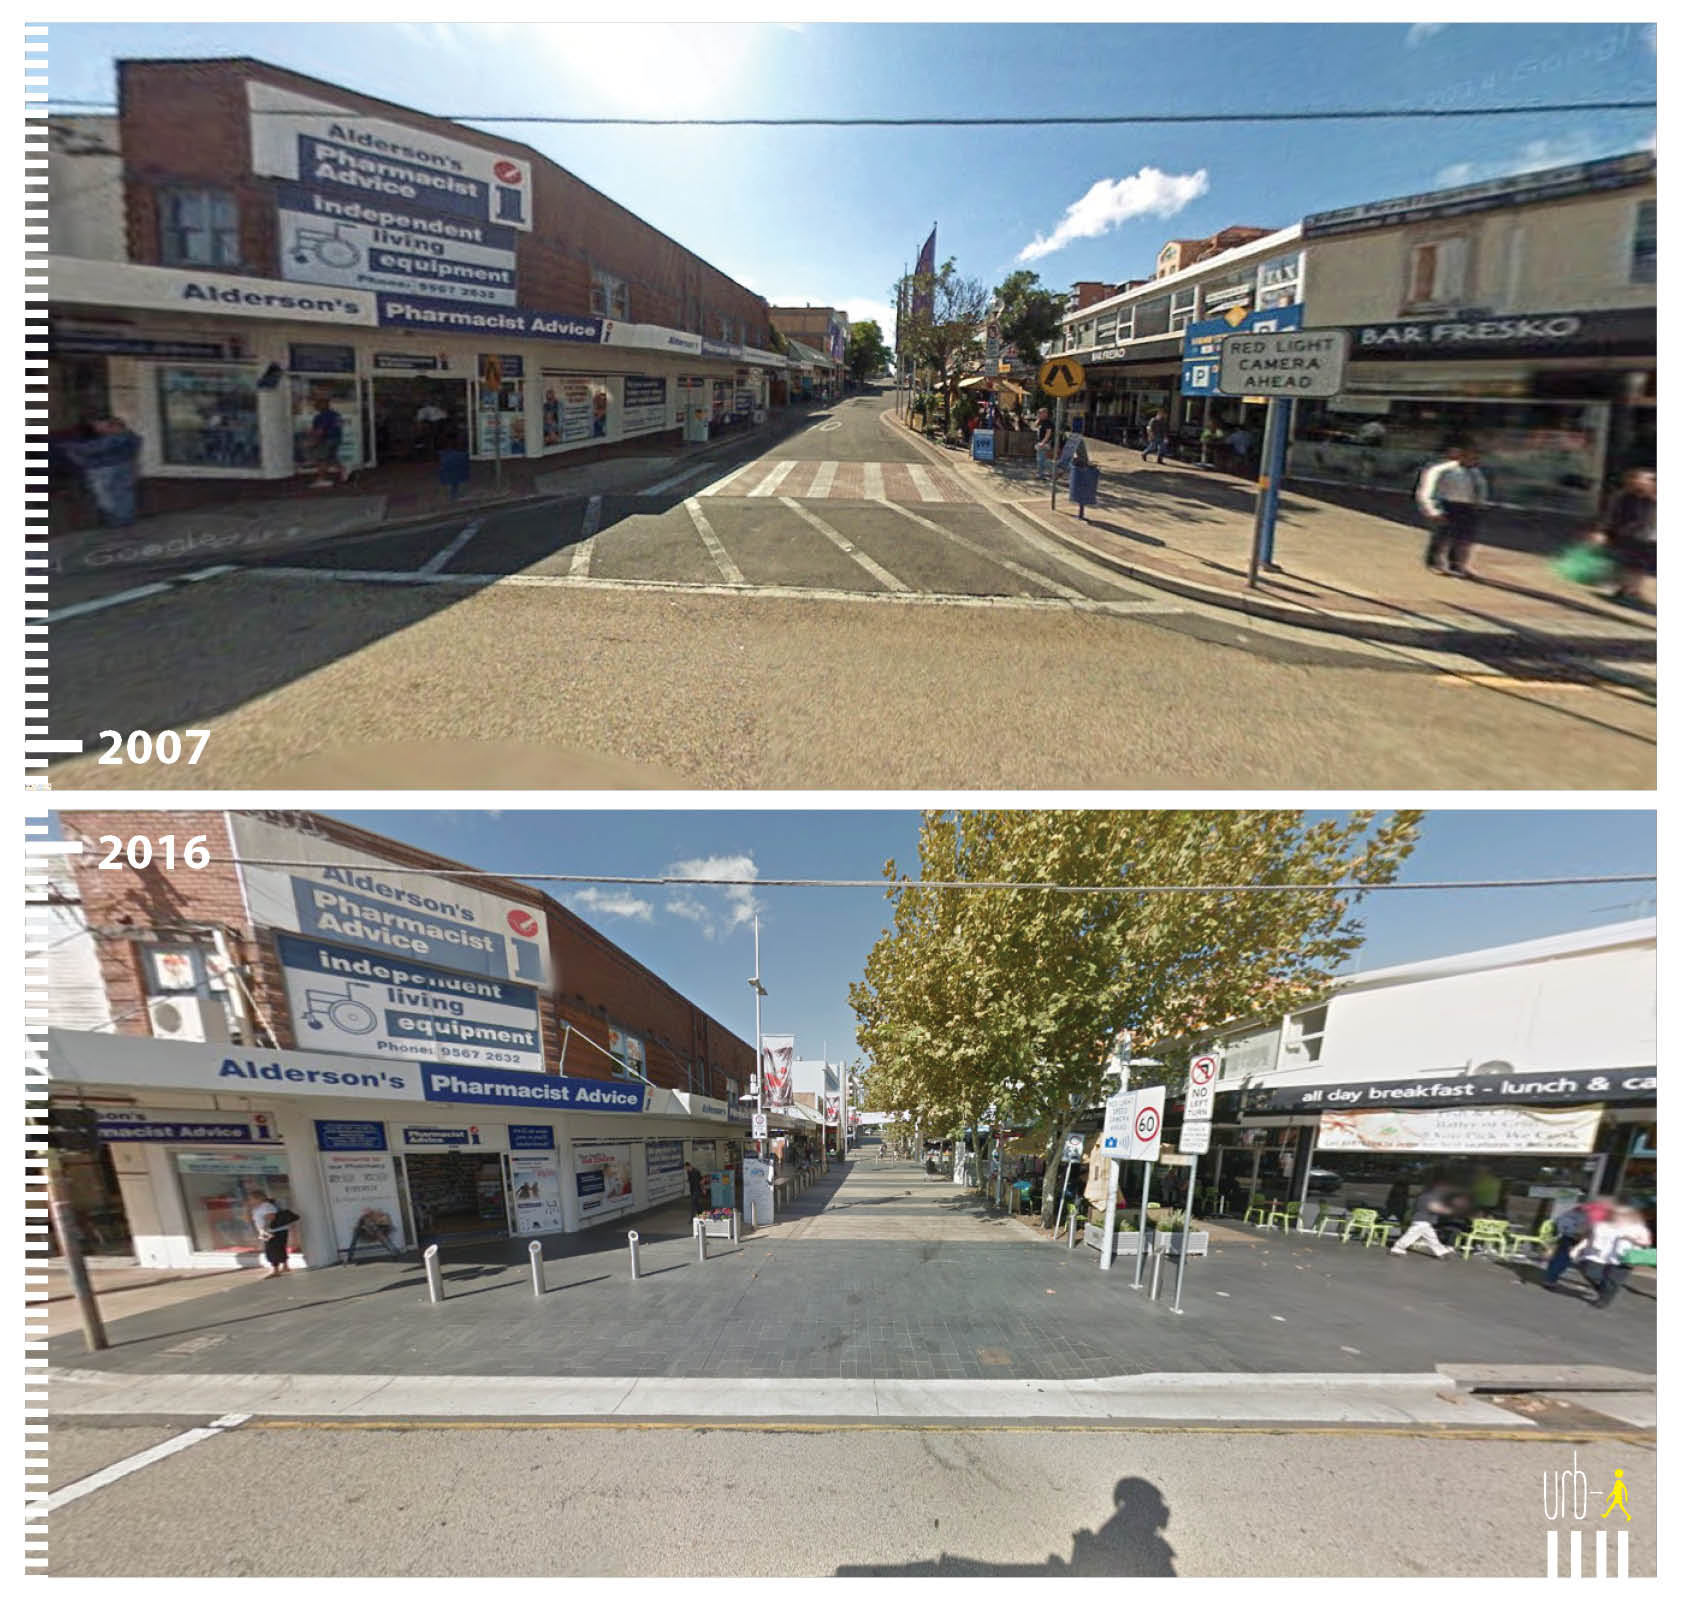 2681 AU Rockdale, Sydney, King Street